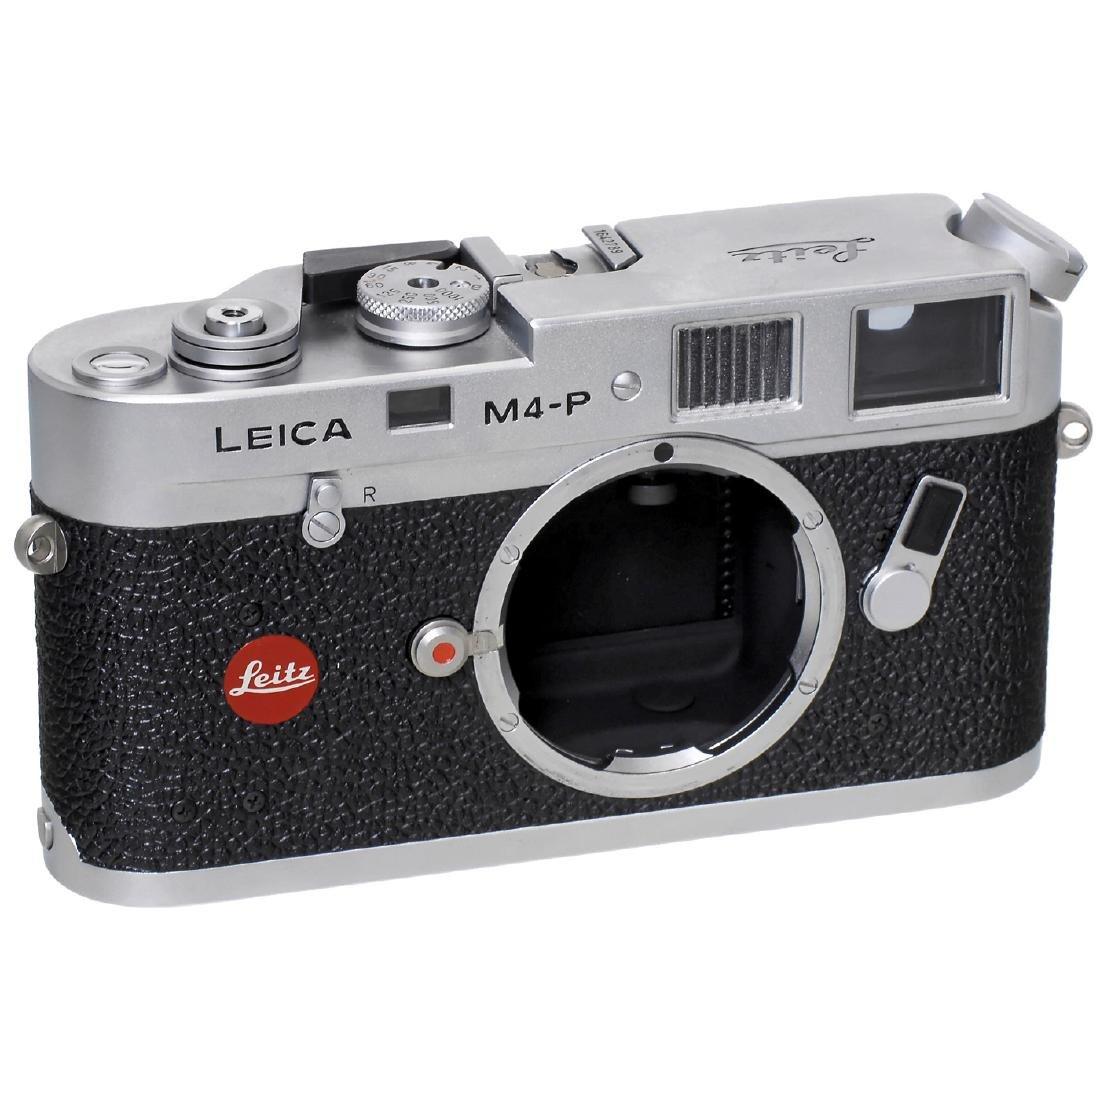 Leica M4-P, 1984